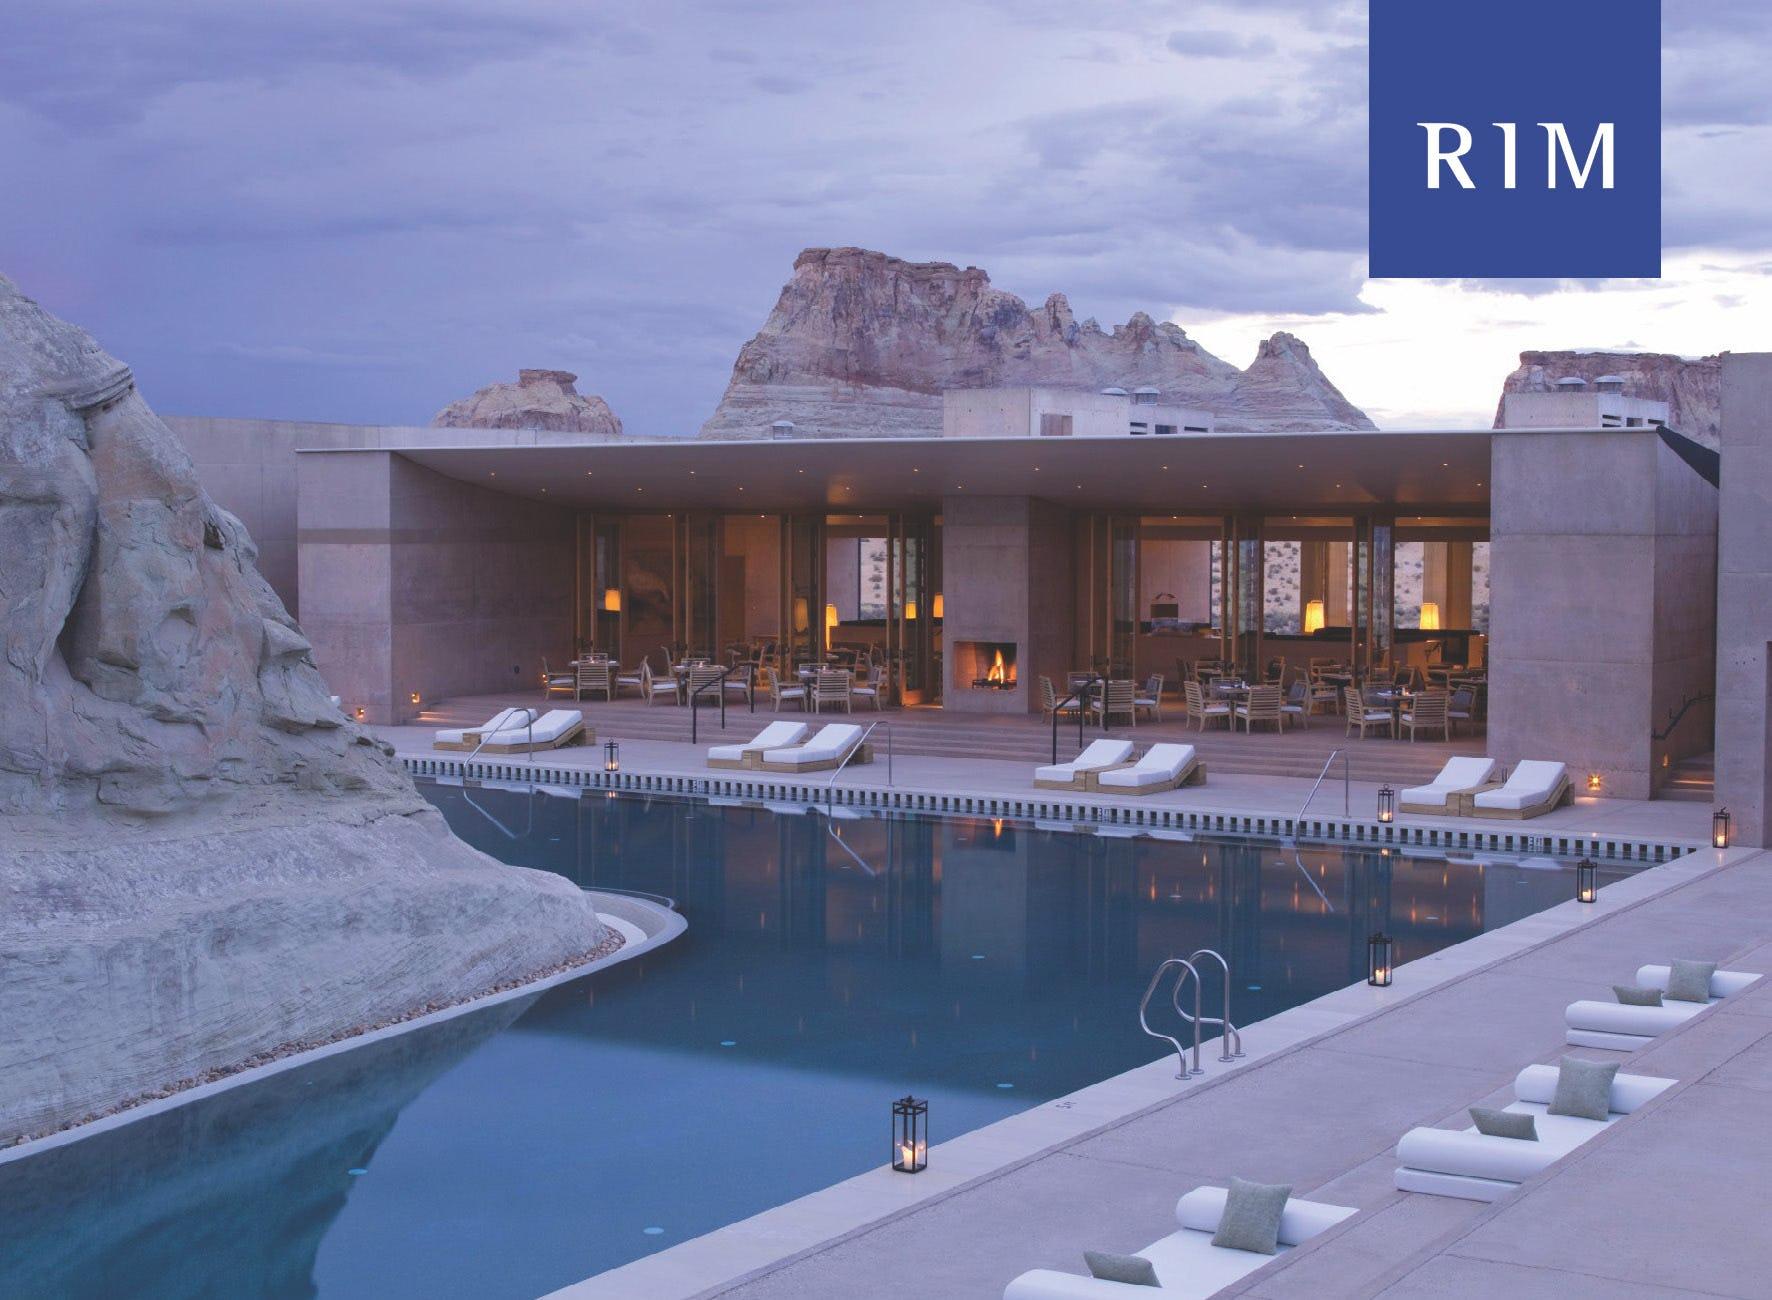 Rim hospitality experience issuu page 01